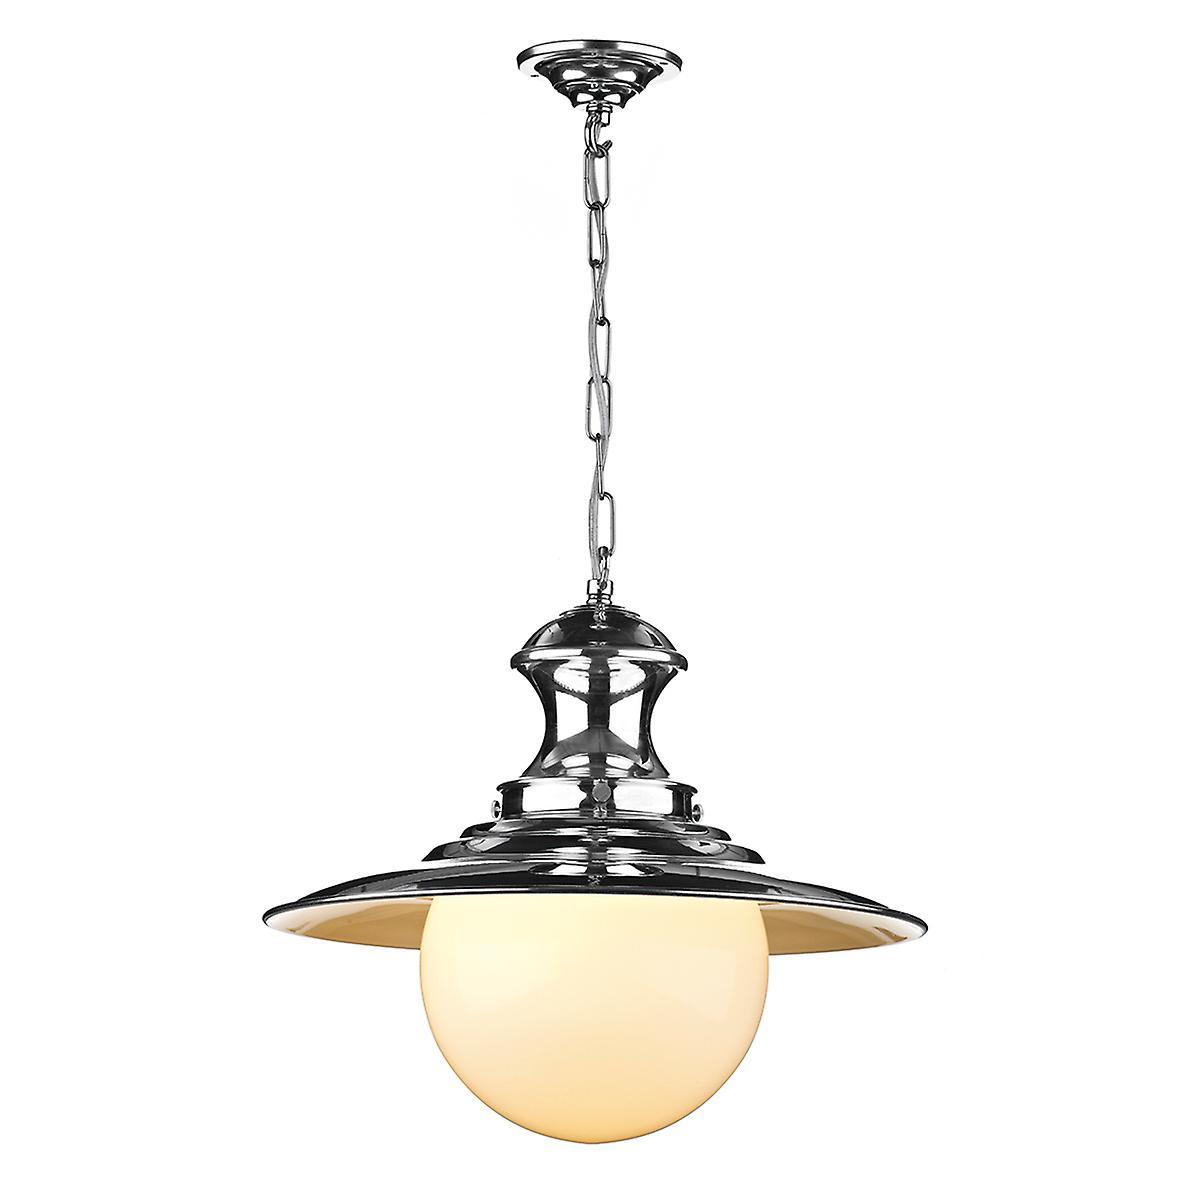 David Hunt EP50 Station Large Pendant Lamp In Polished Chrome